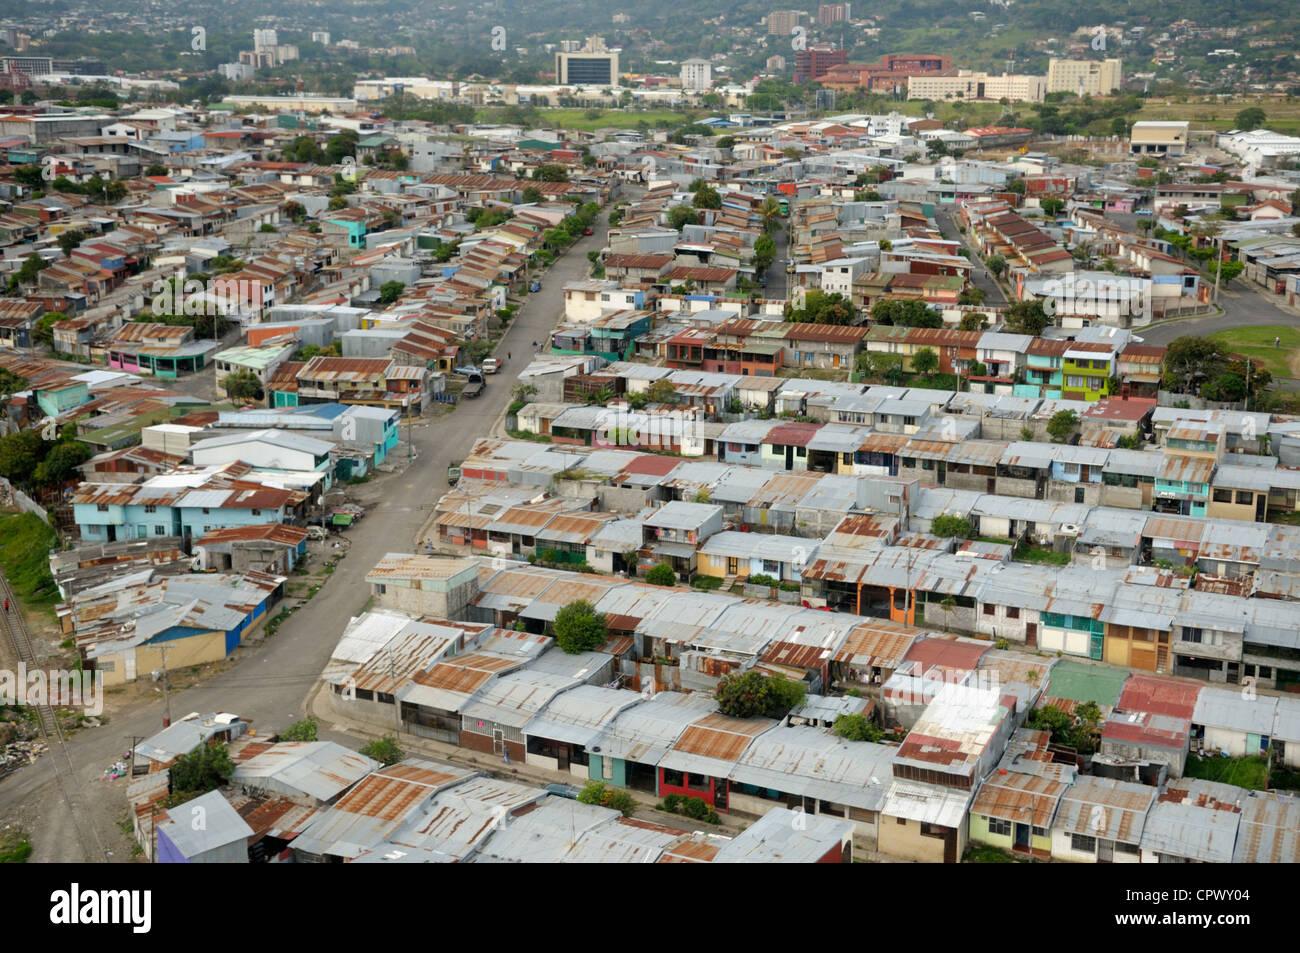 San Jose, Costa Rica, de l'air Photo Stock